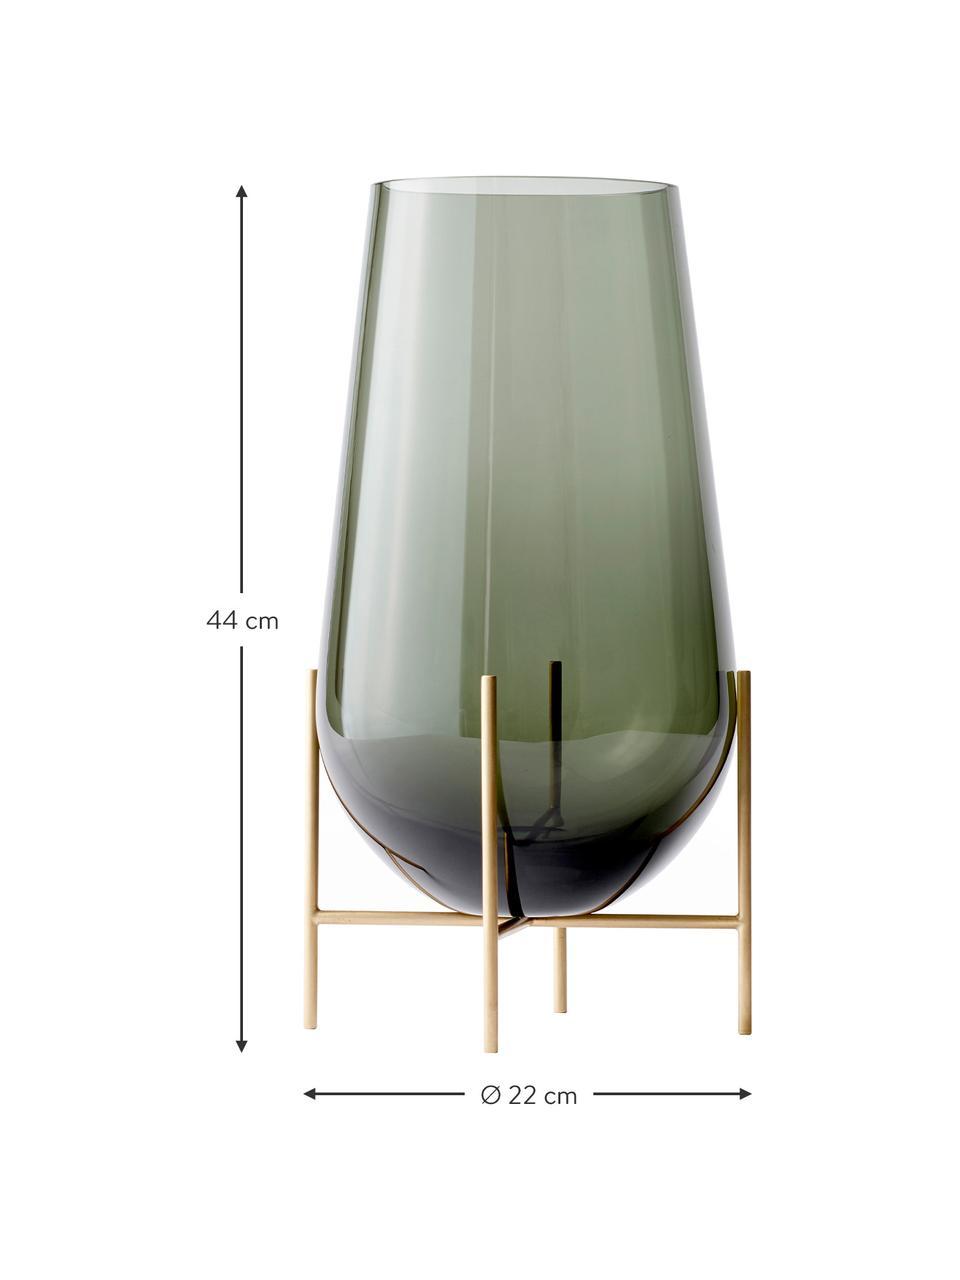 Große Design-Vase Échasse, Gestell: Messing, Vase: Glas, mundgeblasen, Messingfarben, Grau, Ø 22 x H 44 cm